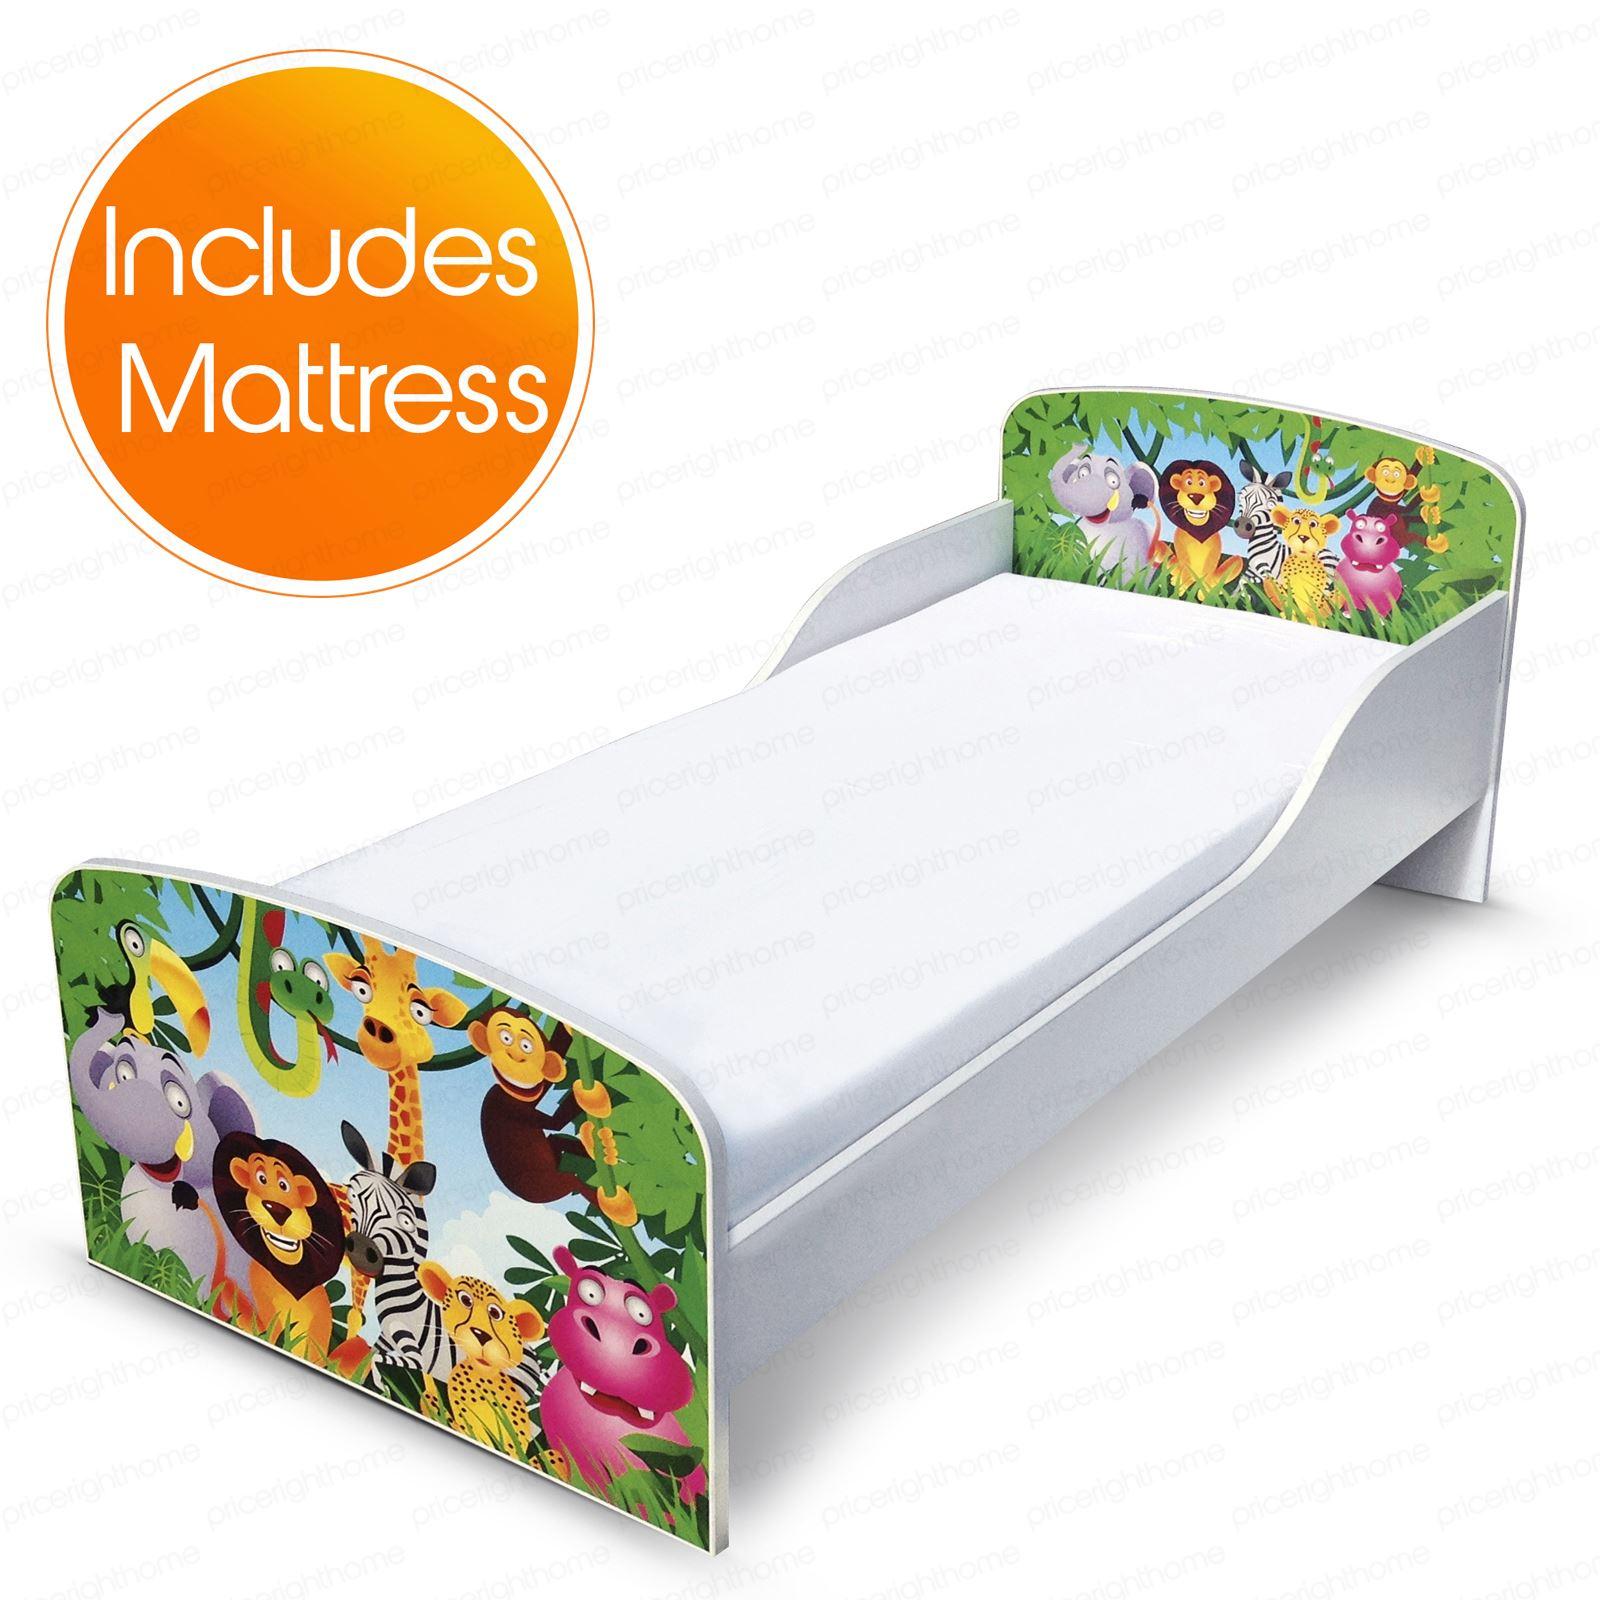 JUNGLE MDF TODDLER BED MATTRESS NEW LION ELEPHANT MONKEY ZEBRA